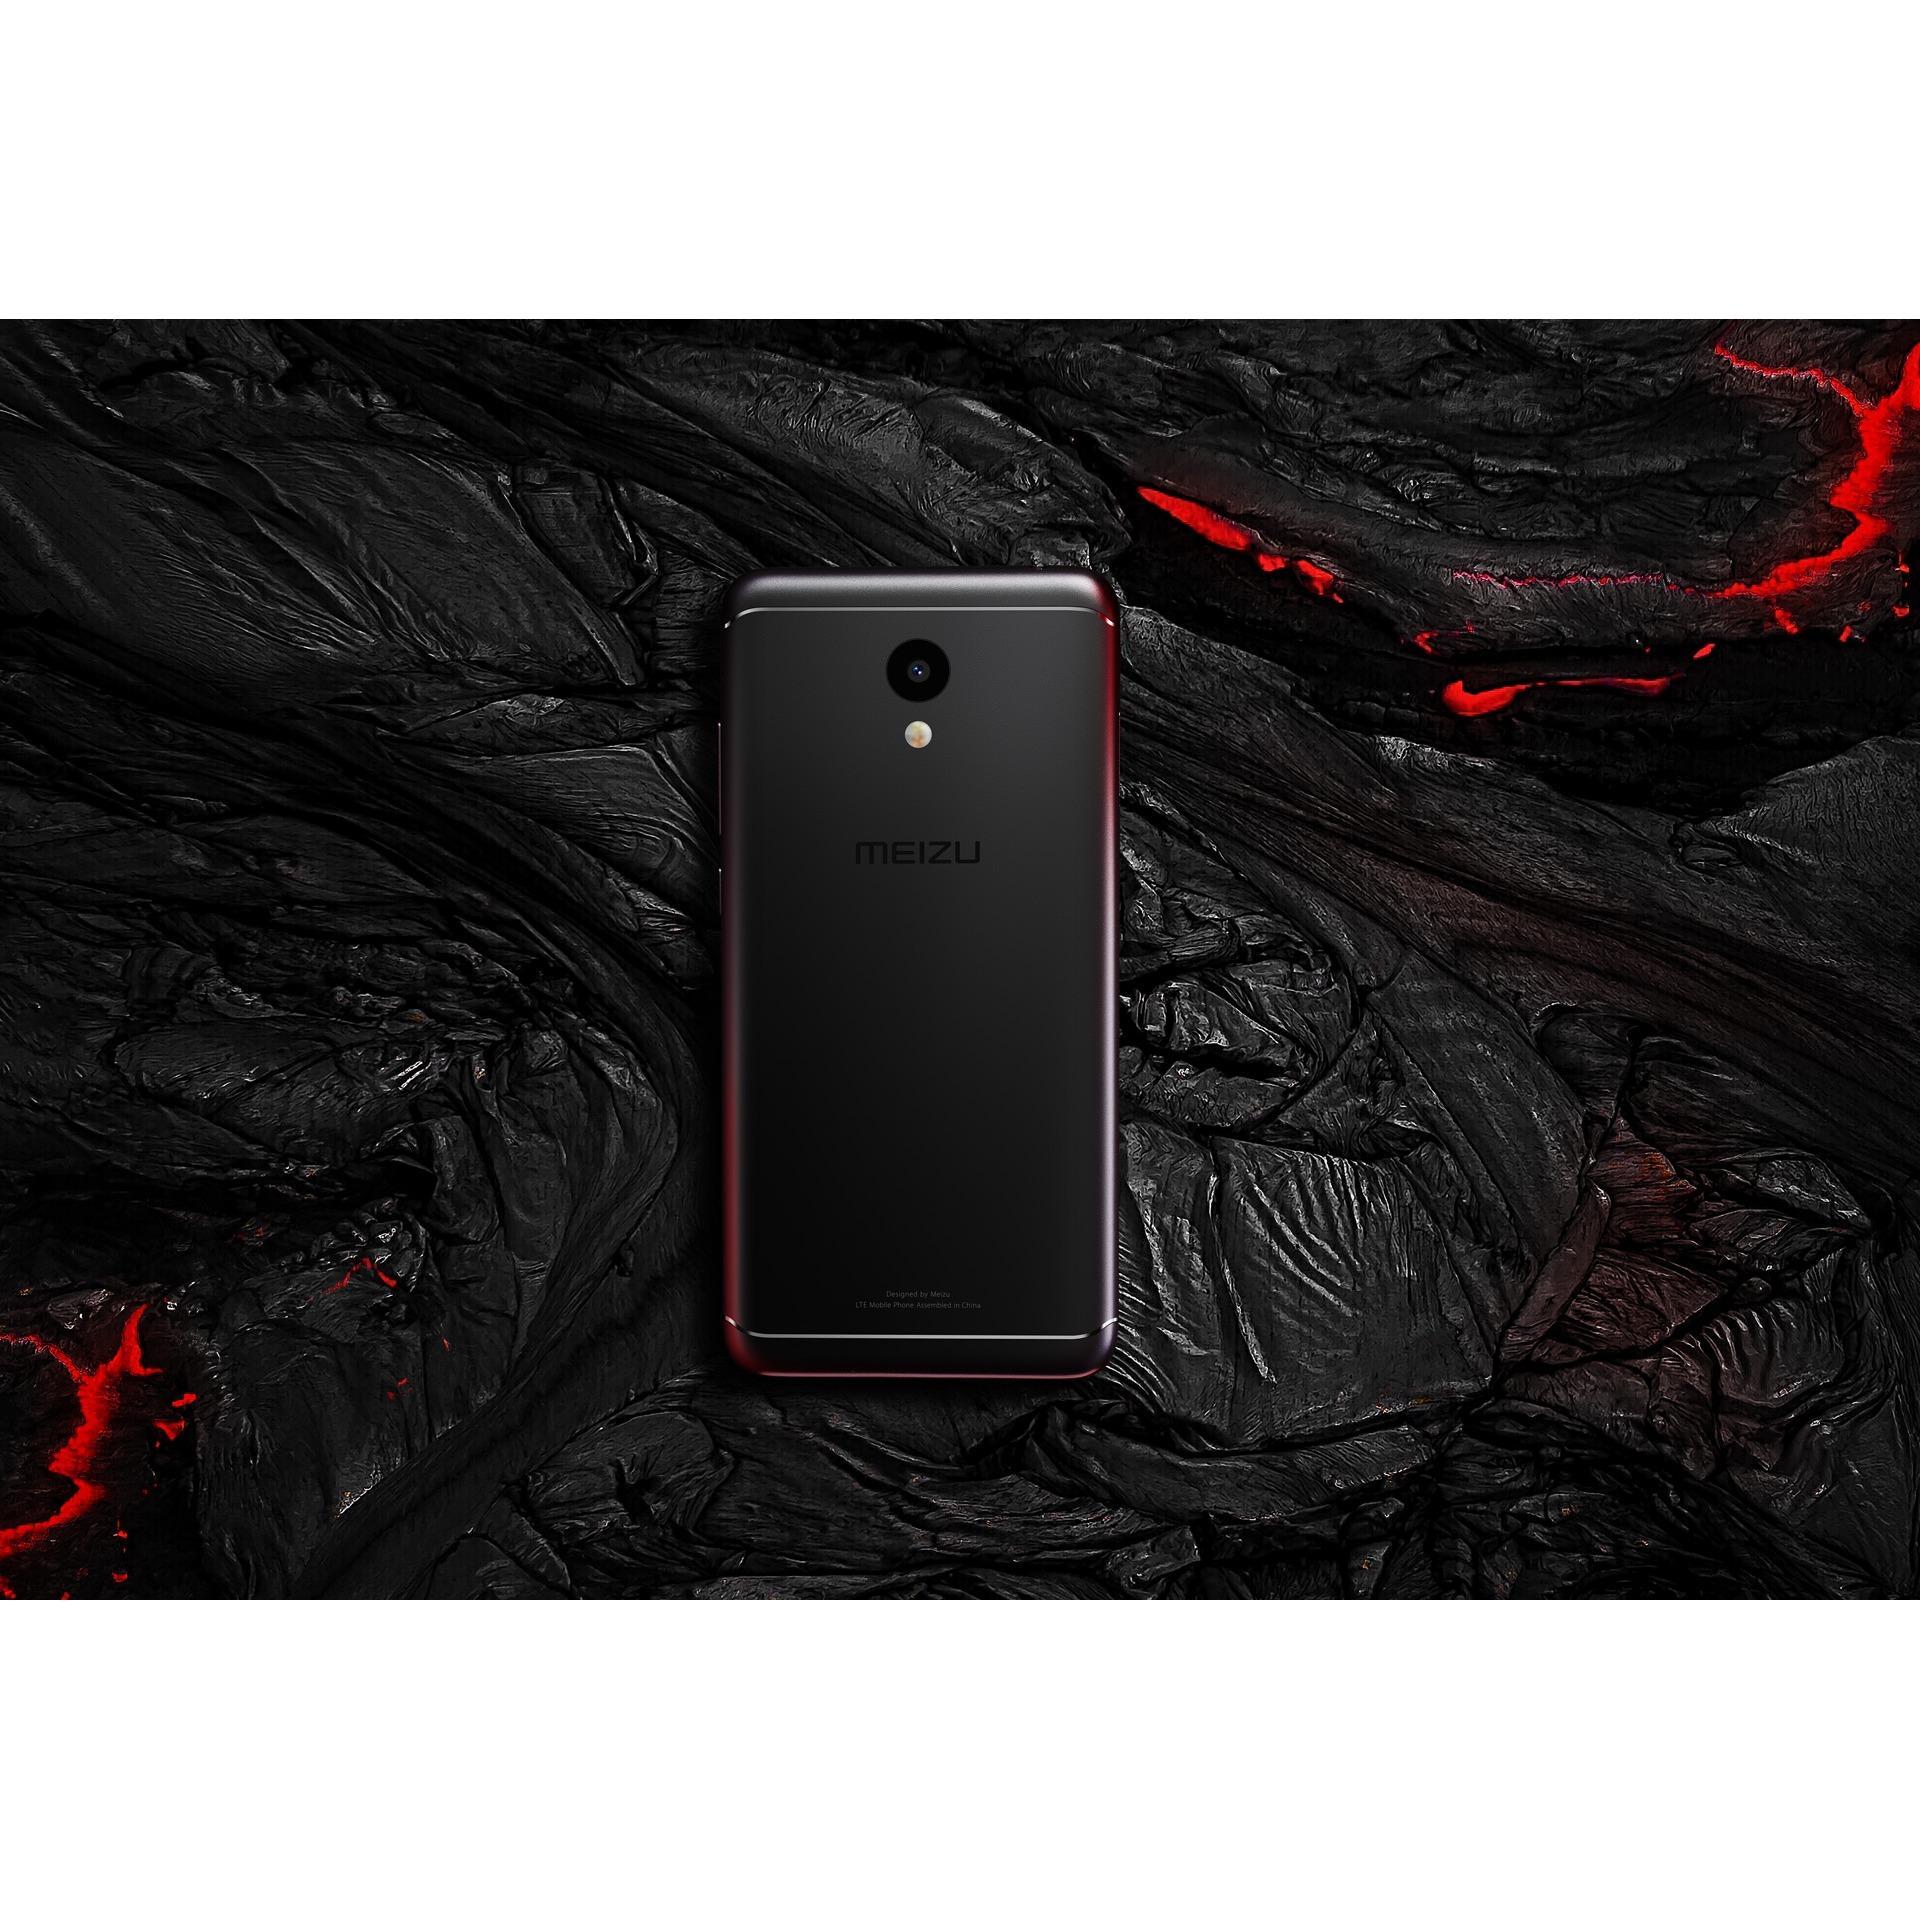 Cek Harga Baru Meizu M6 Black 16gb 2gb Garansi Resmi Indonesia Asus Zenfone 2 Ze550ml Lte Ram 1 Tahun